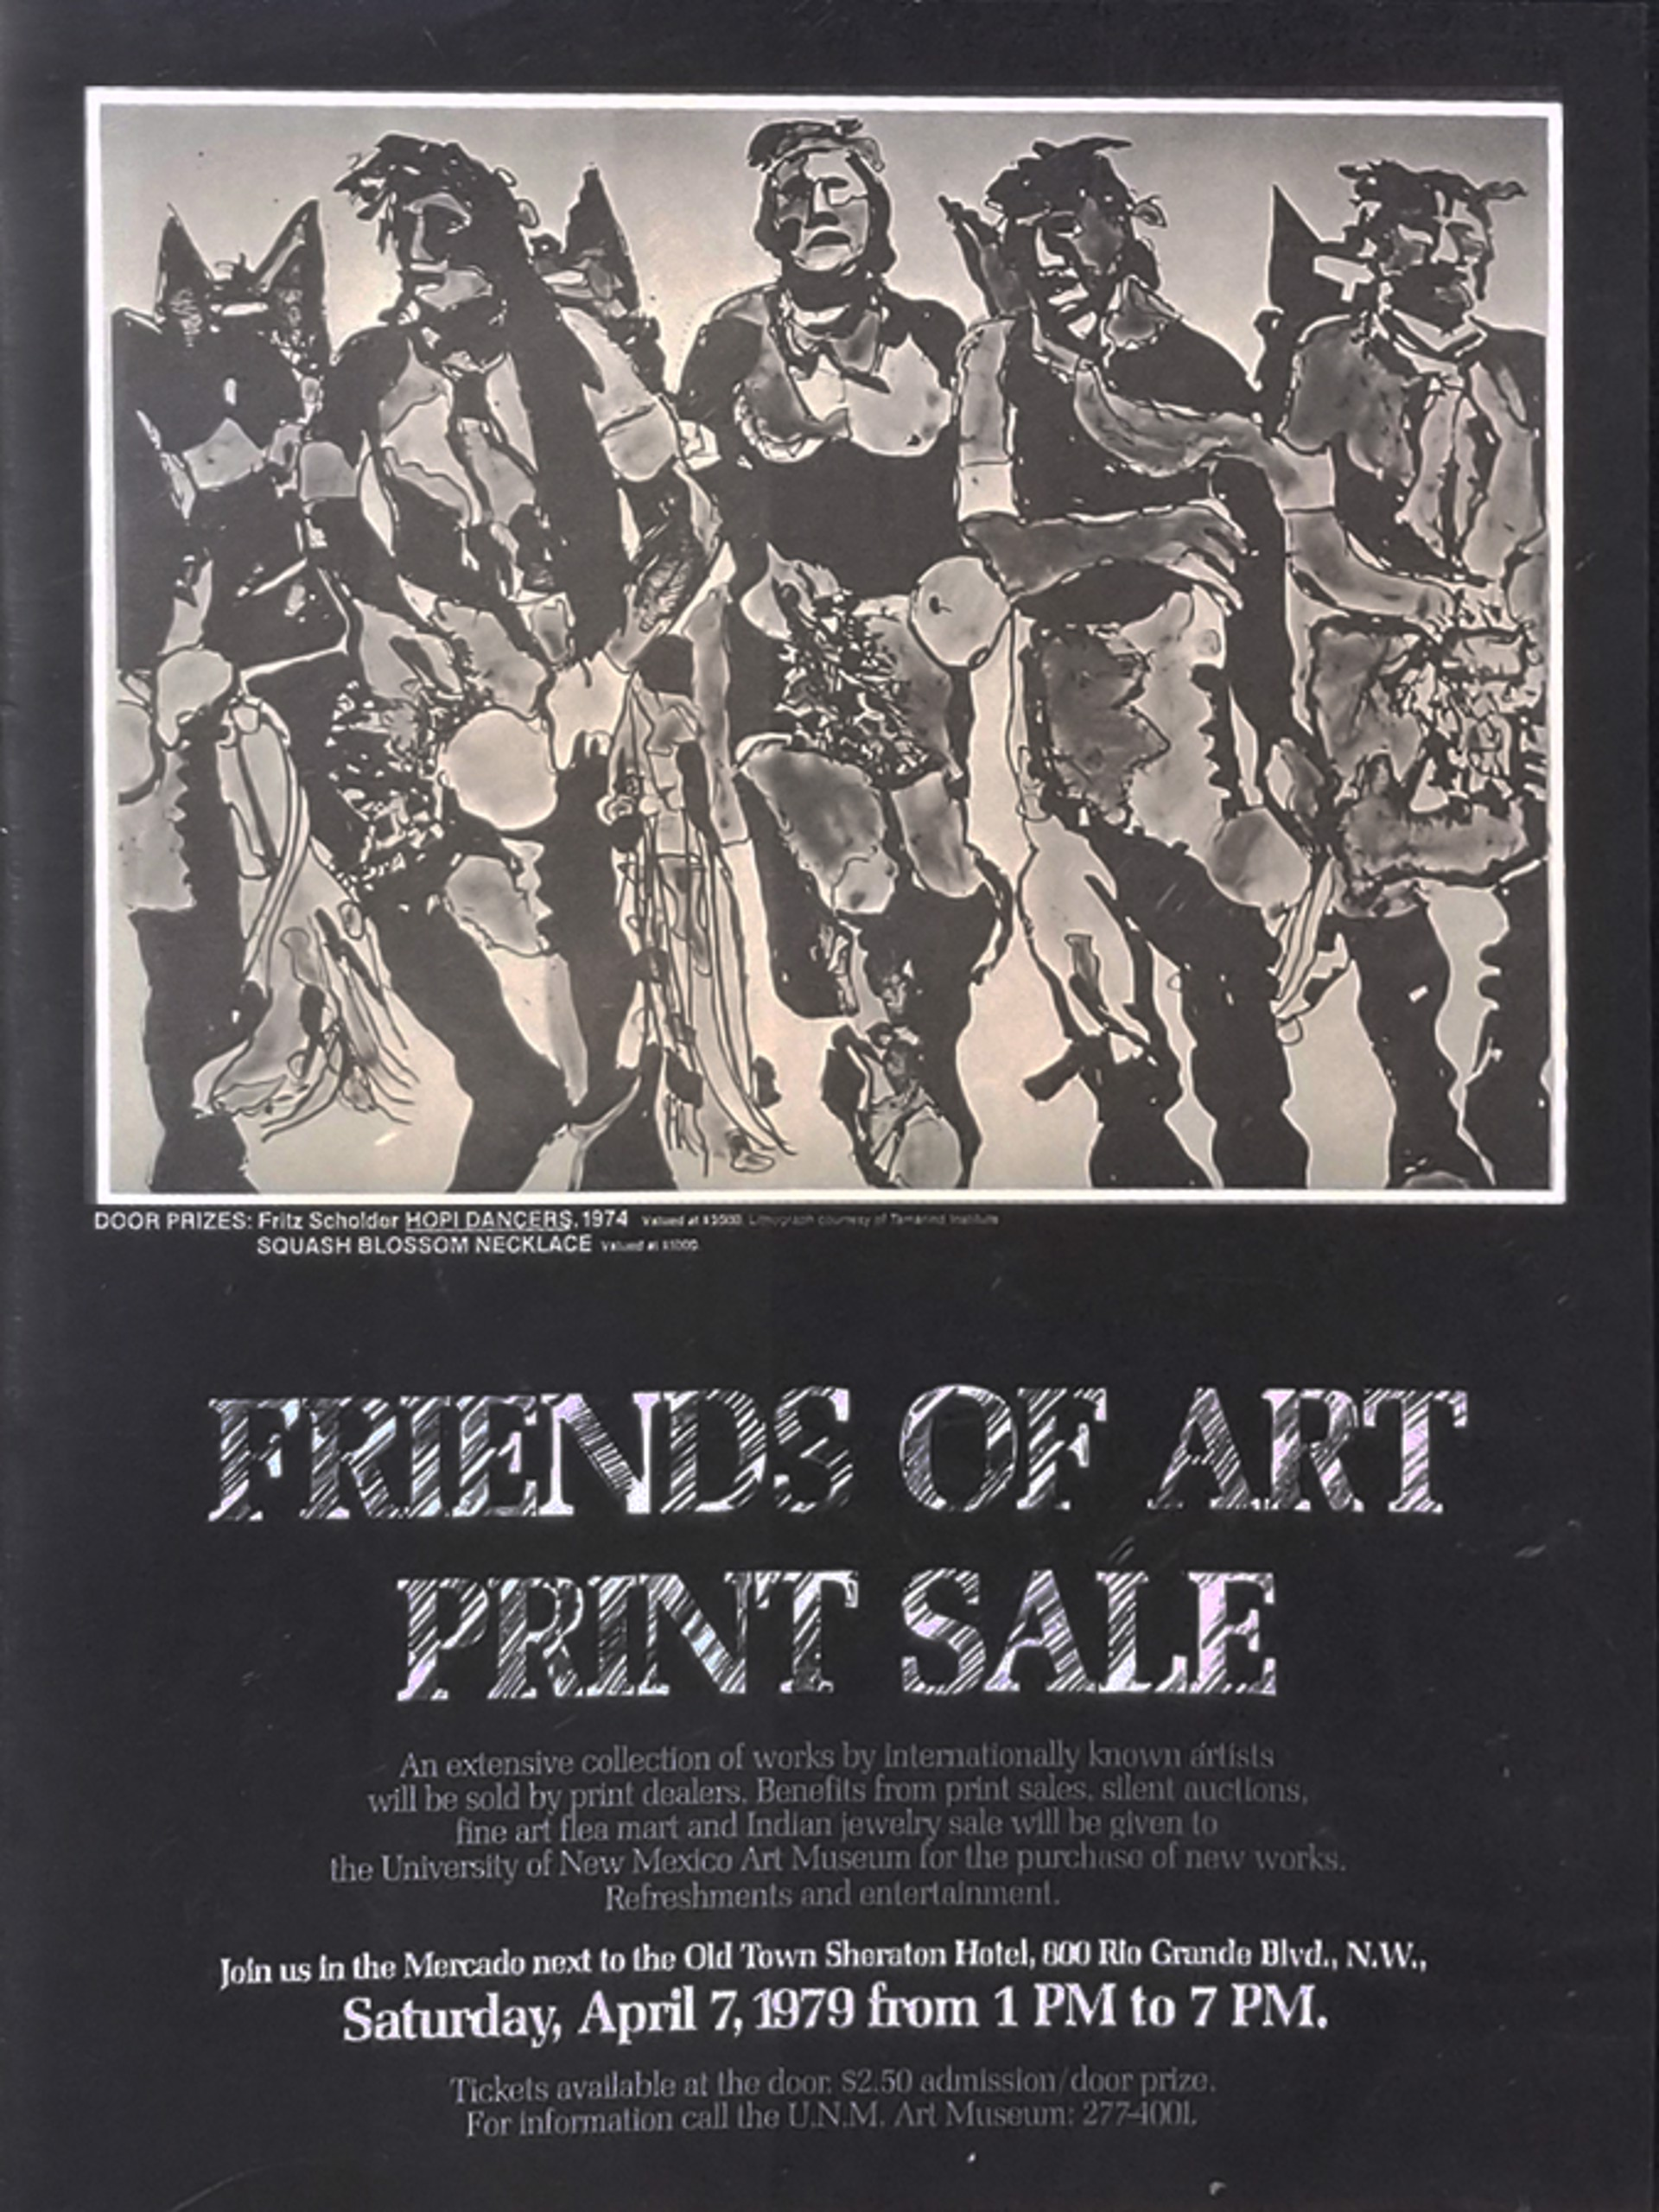 Friends of Art Poster by Fritz Scholder